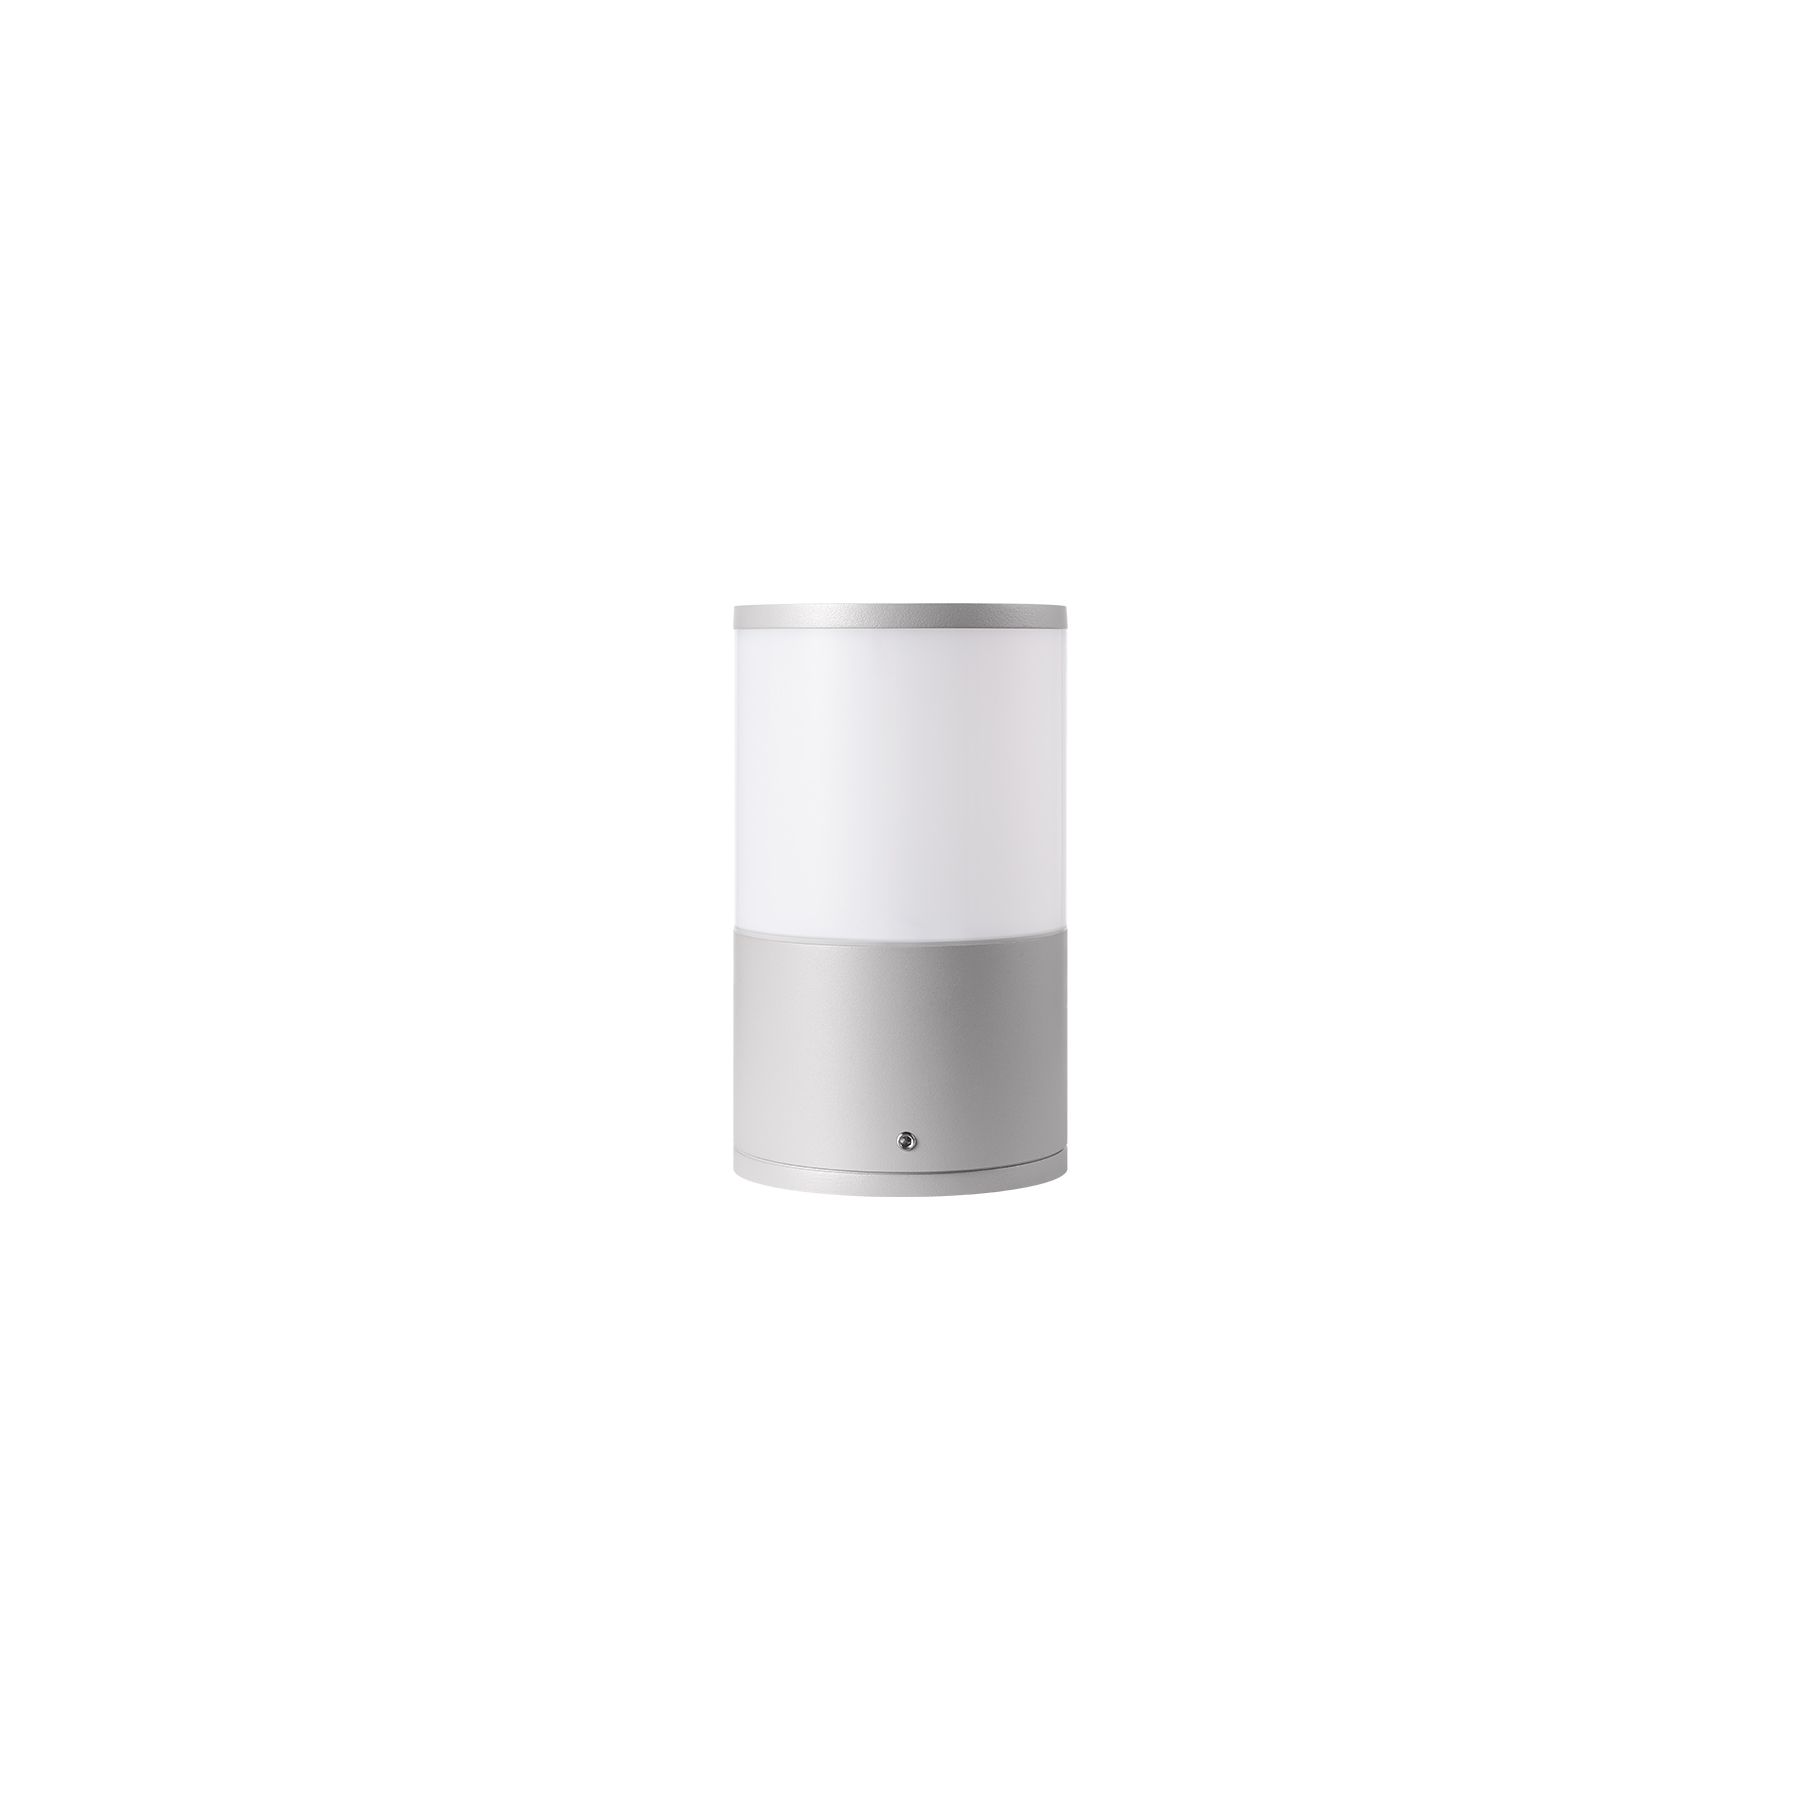 PROTON Round Opal - Pillar Top Light